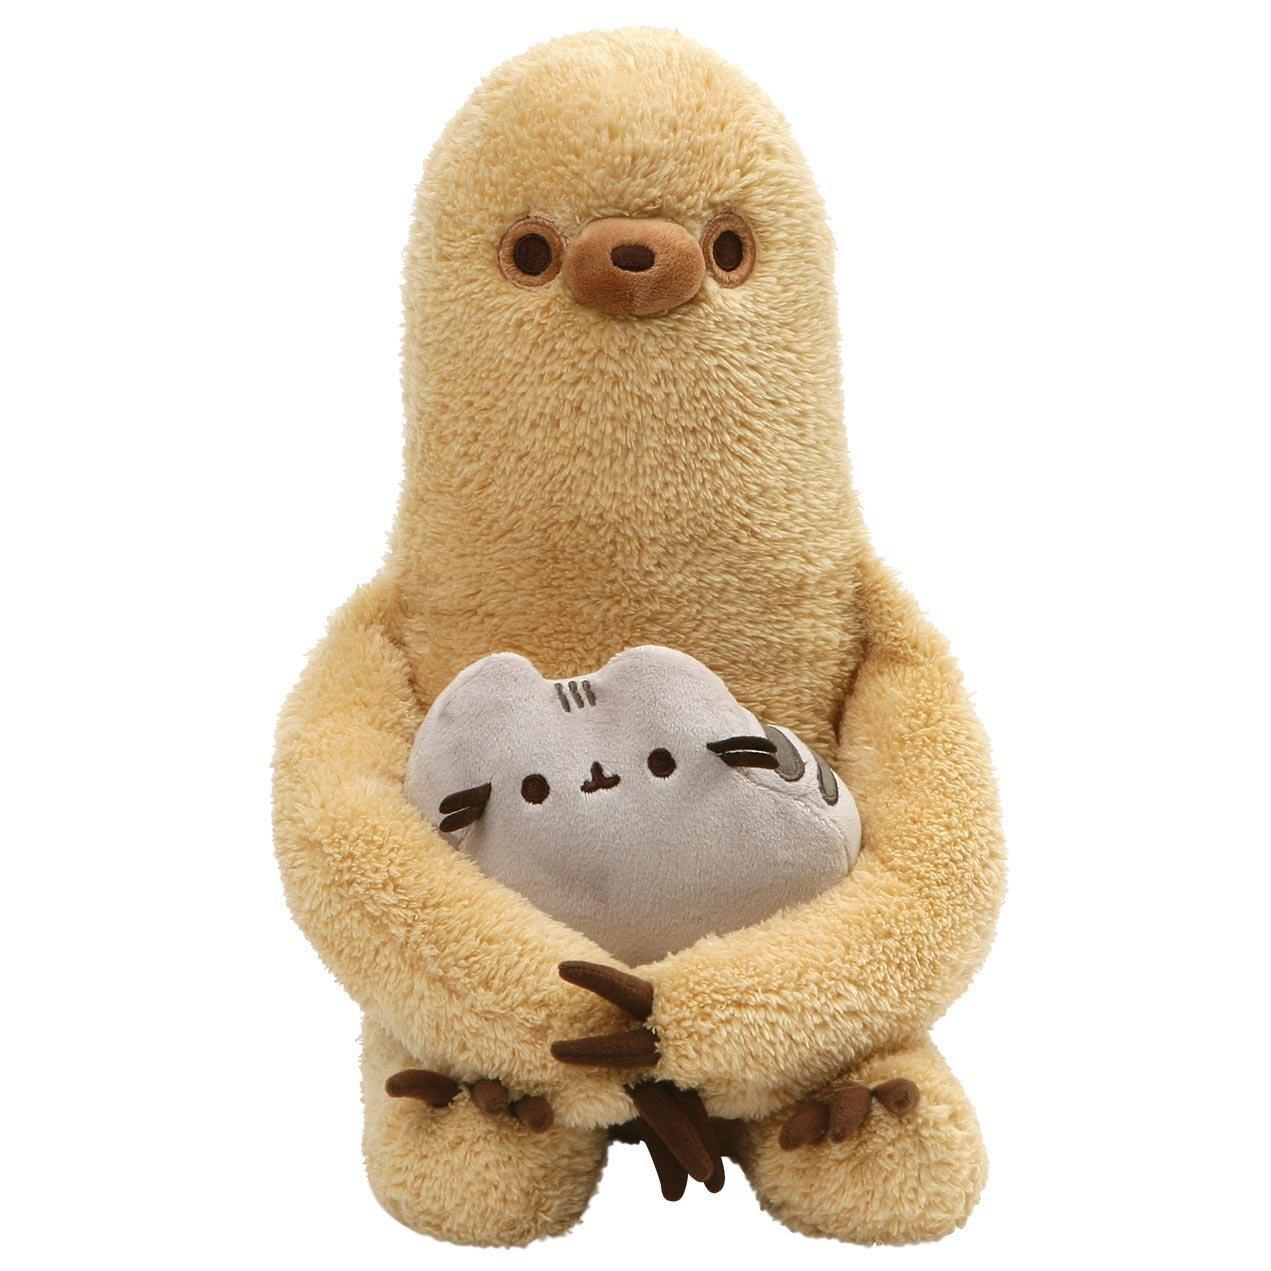 "GUND Pusheen with Sloth Plush Stuffed Animal, Set of 2, Multicolor, 13"""